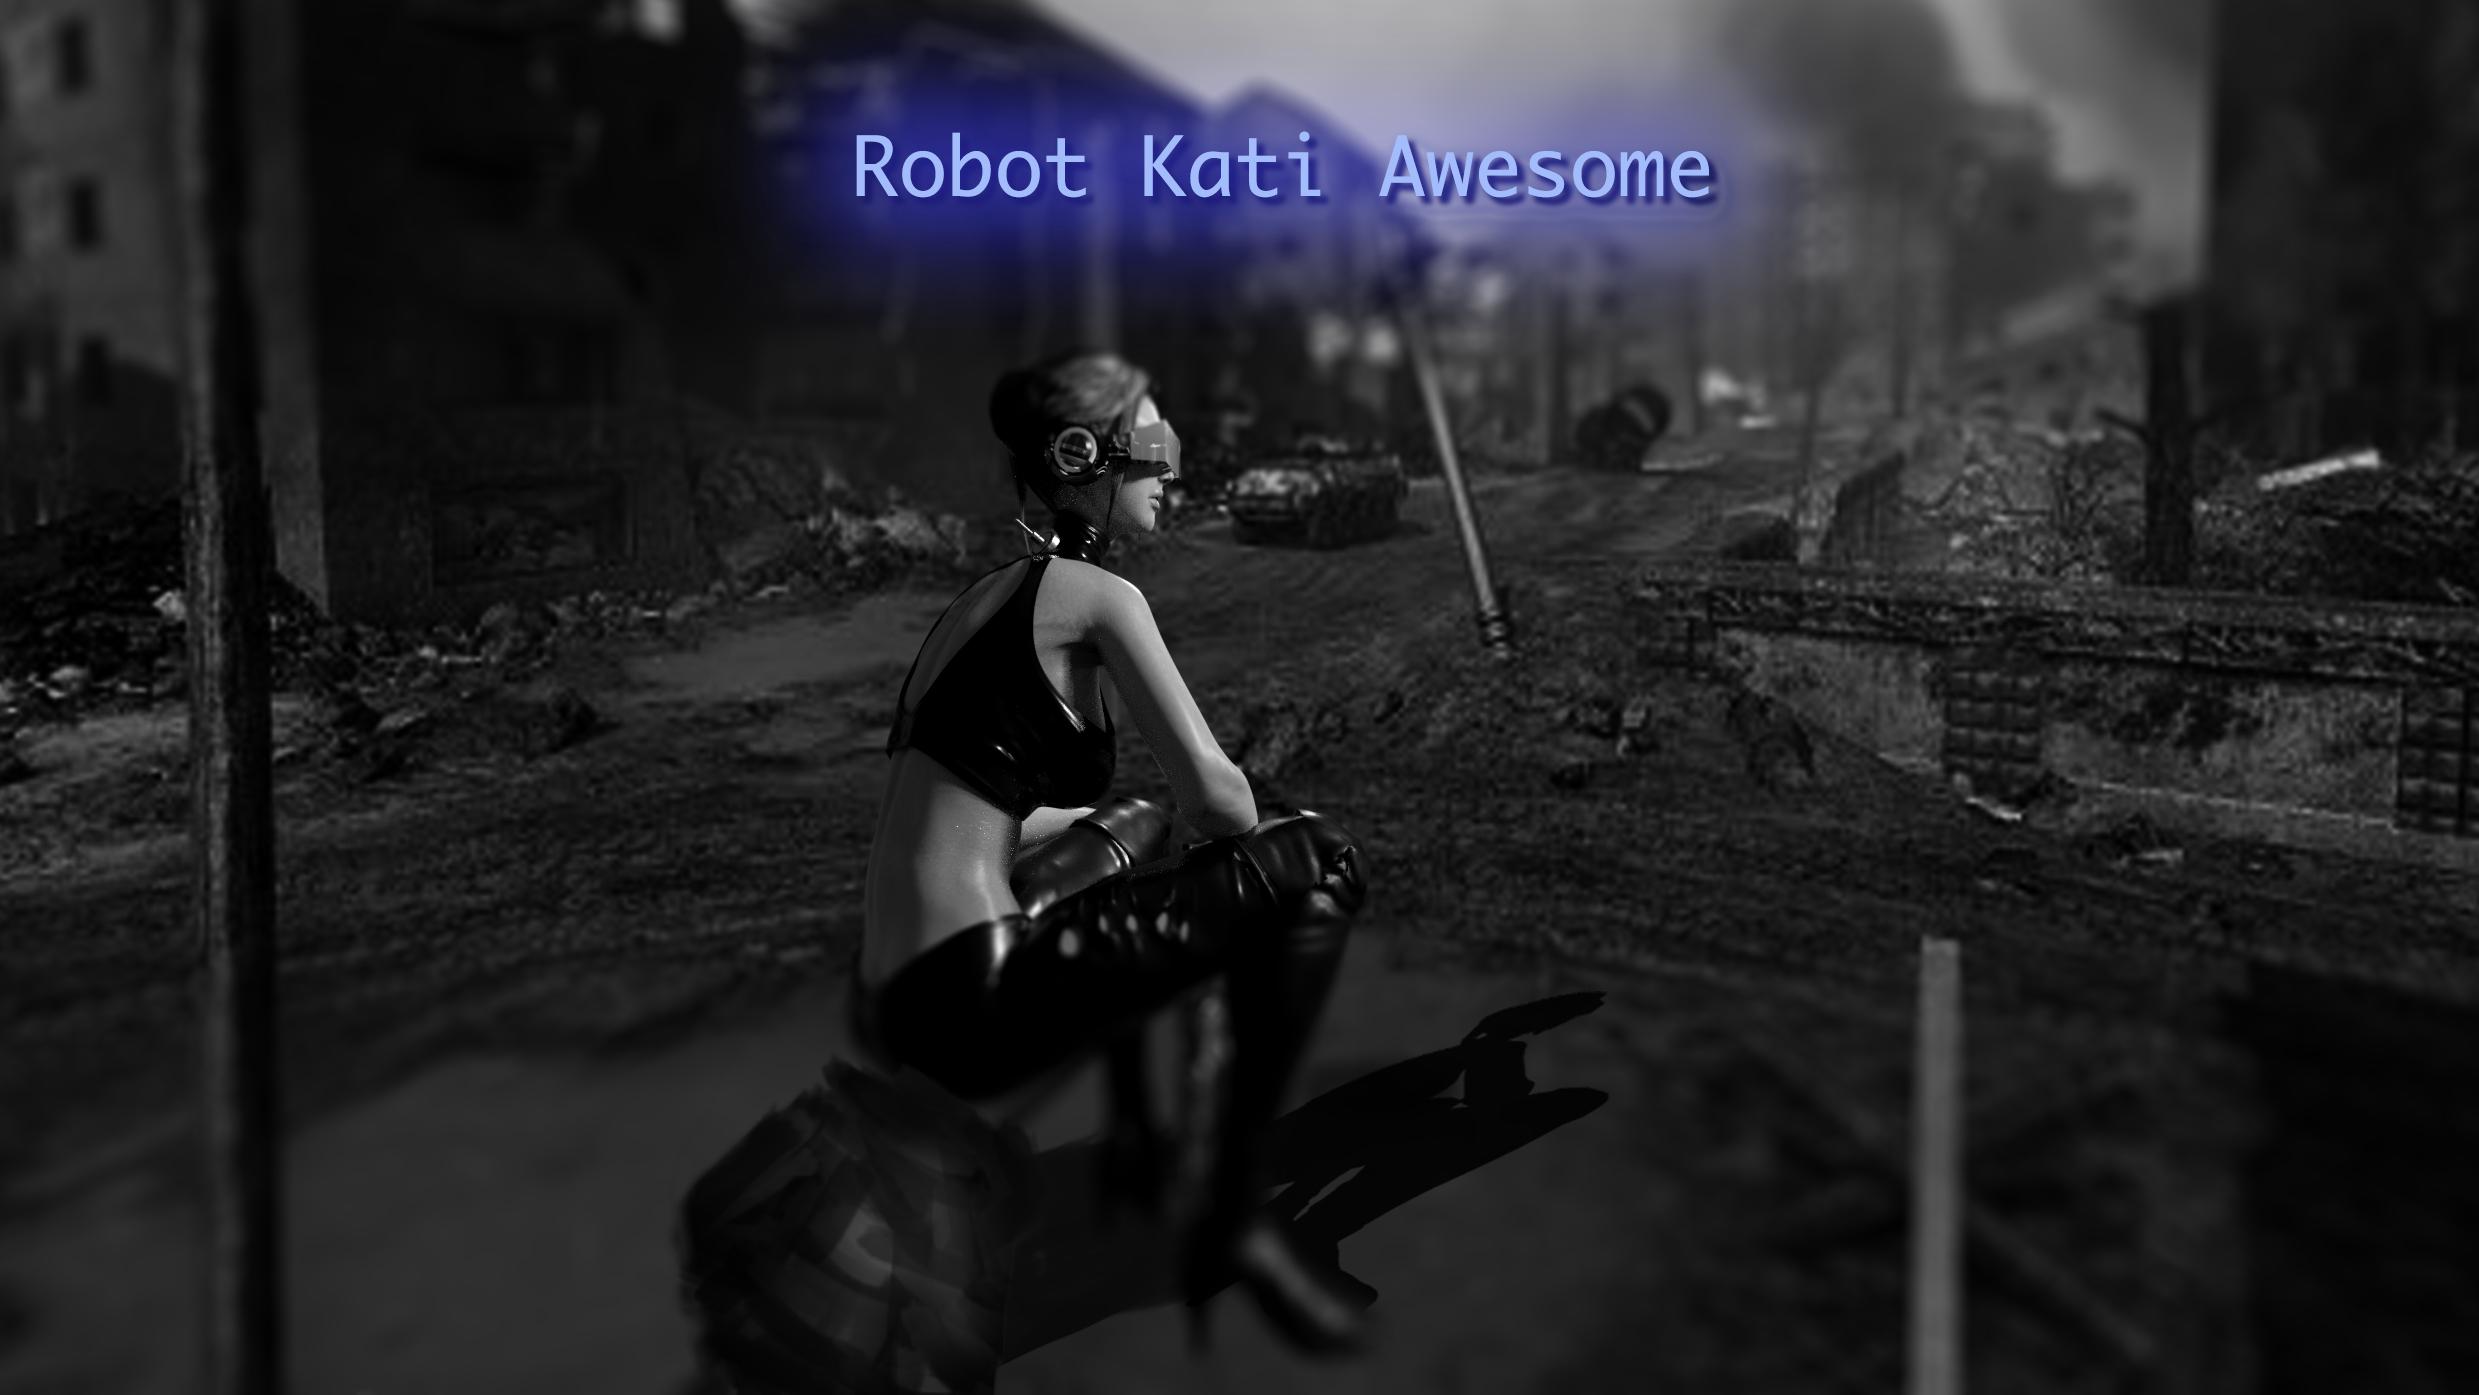 [MWU Korea 2019] 로봇 캐티 어썸 ( RobotKati Awesome)